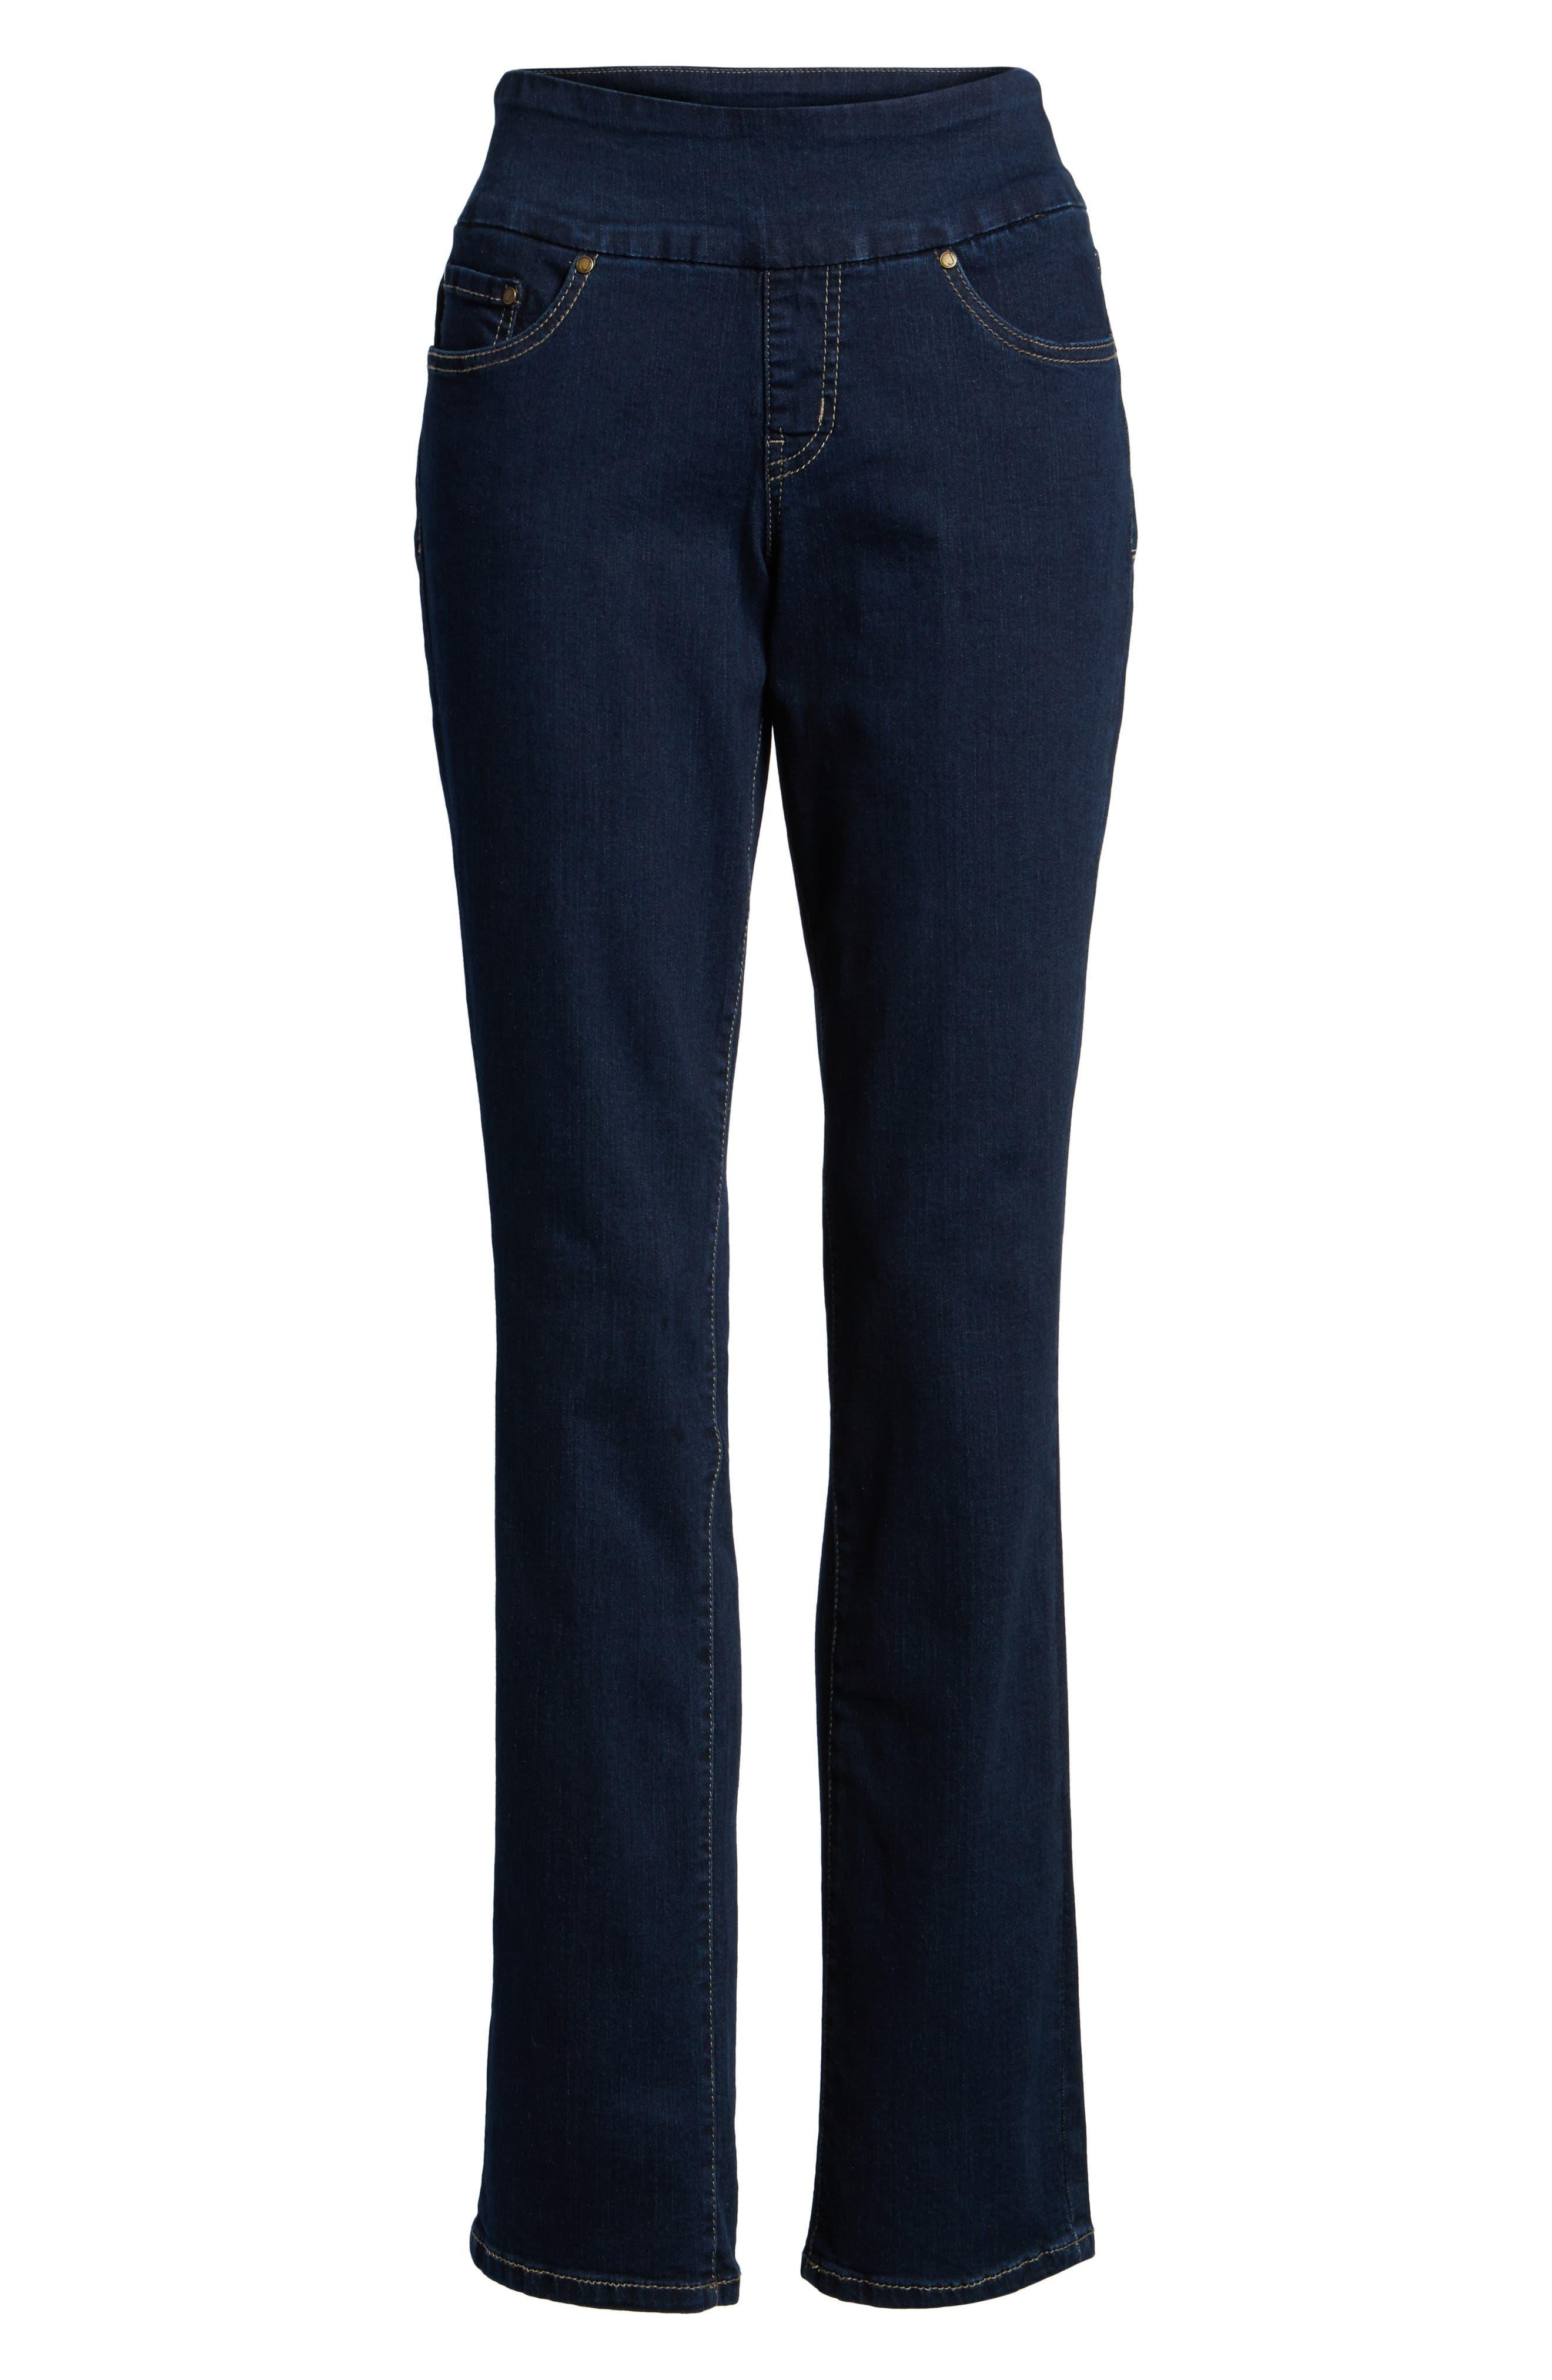 193f210d85e Jag Jeans Clothing